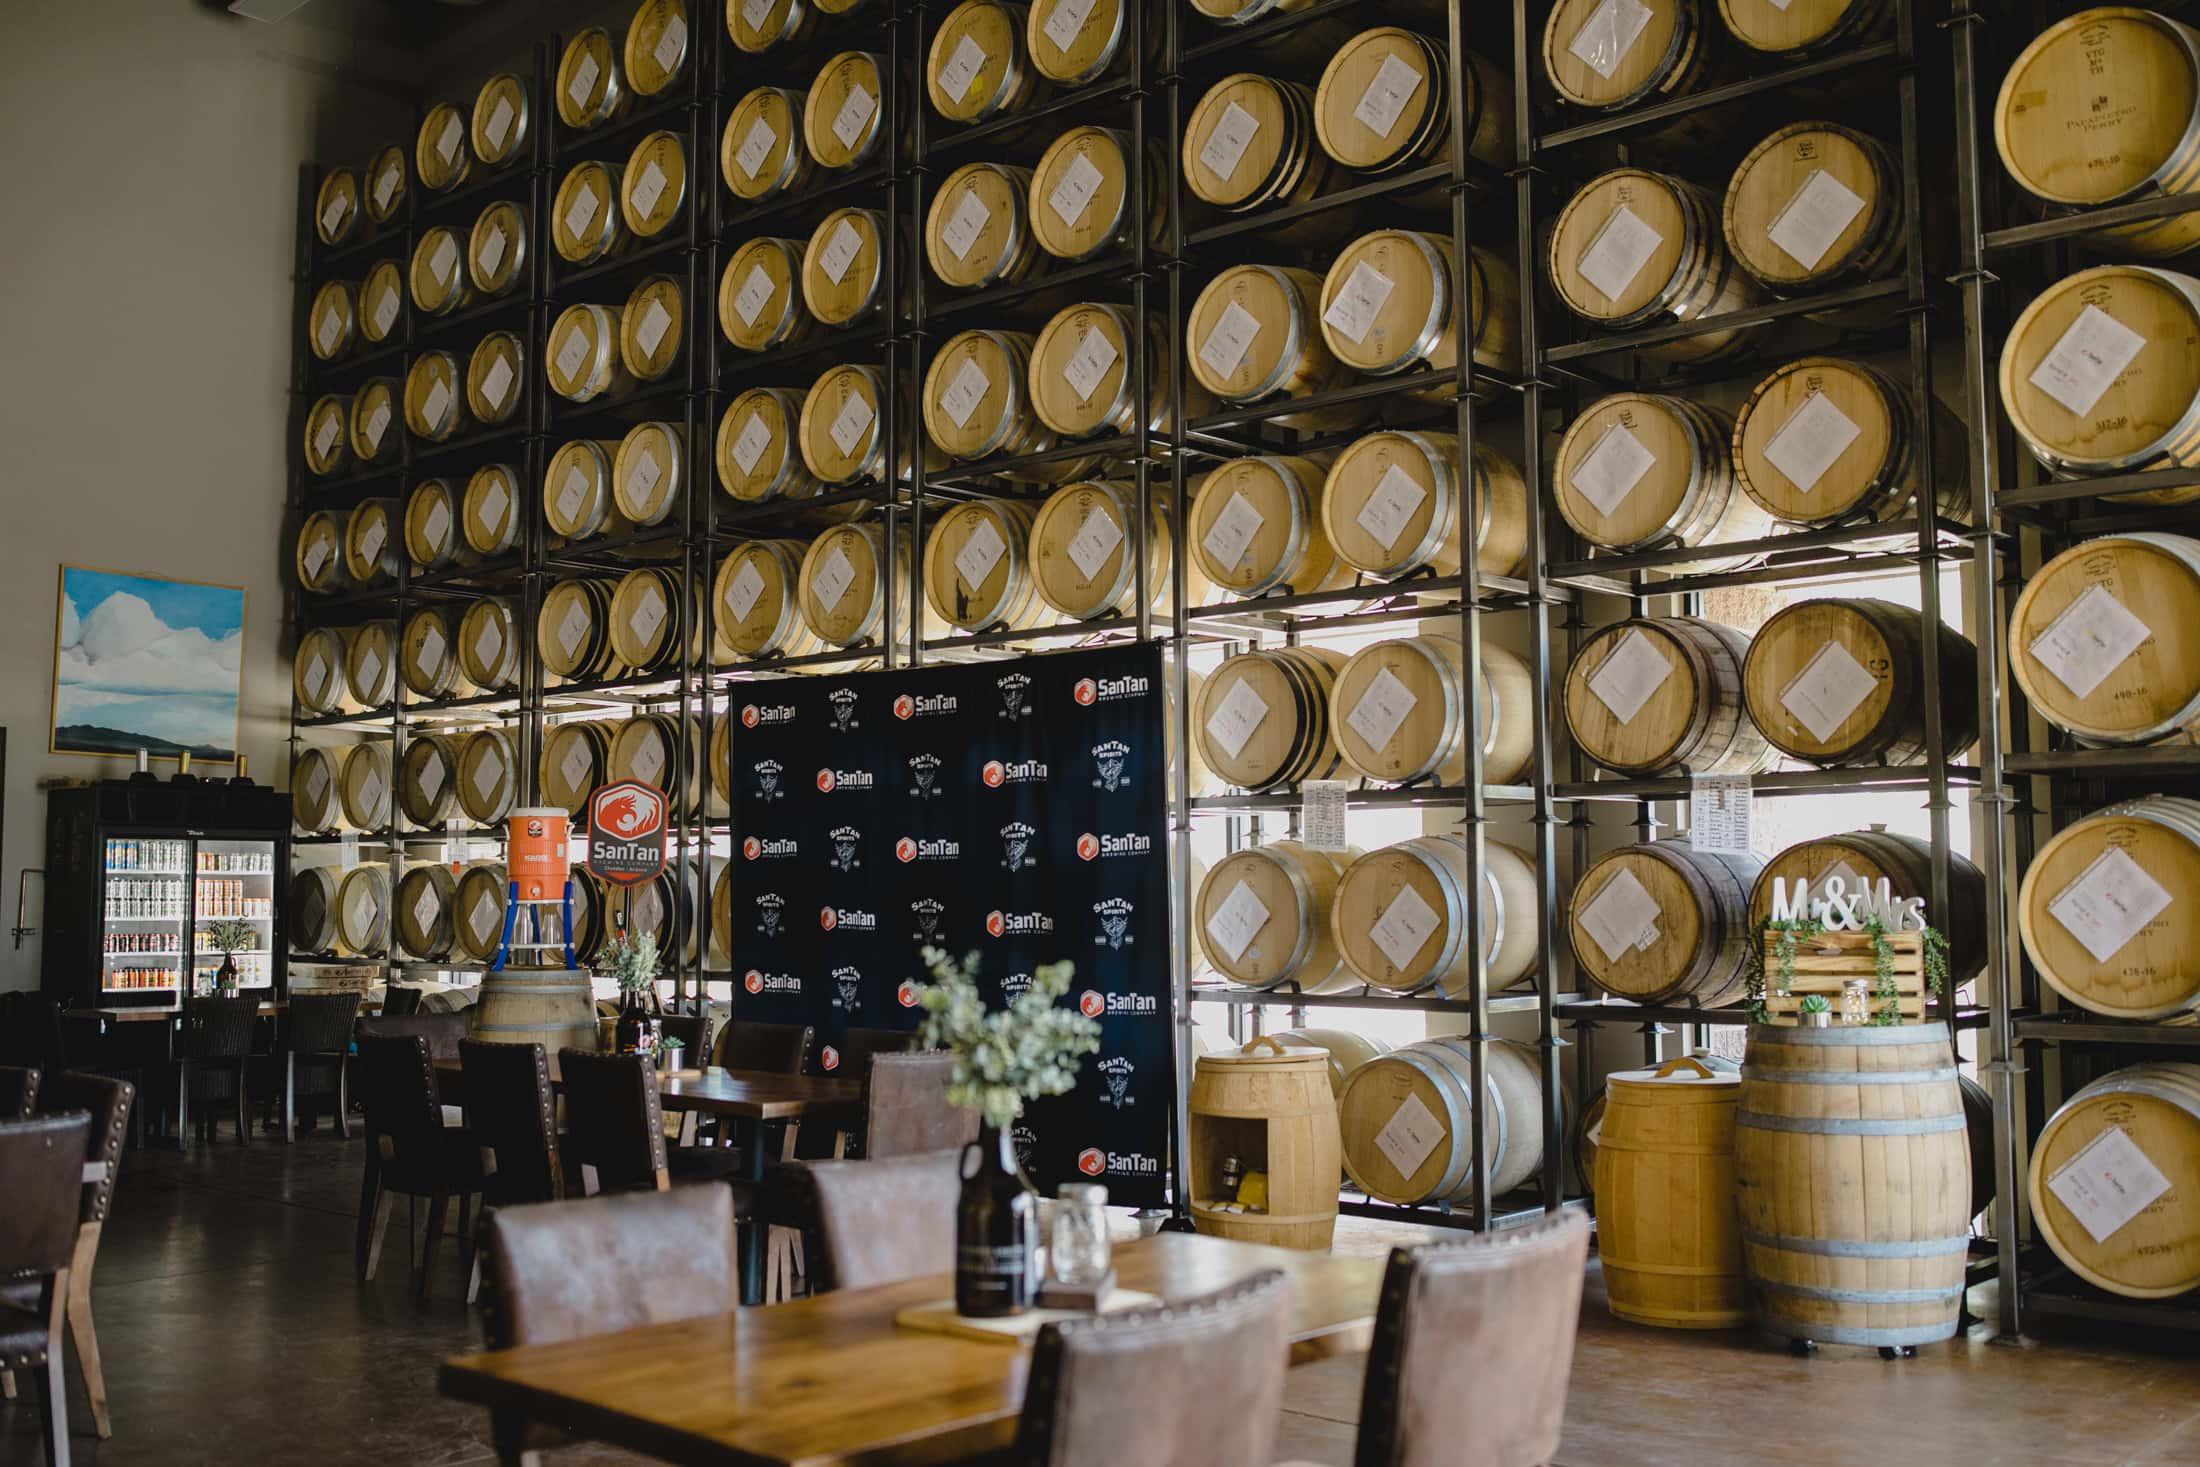 San Tan Brewery venue